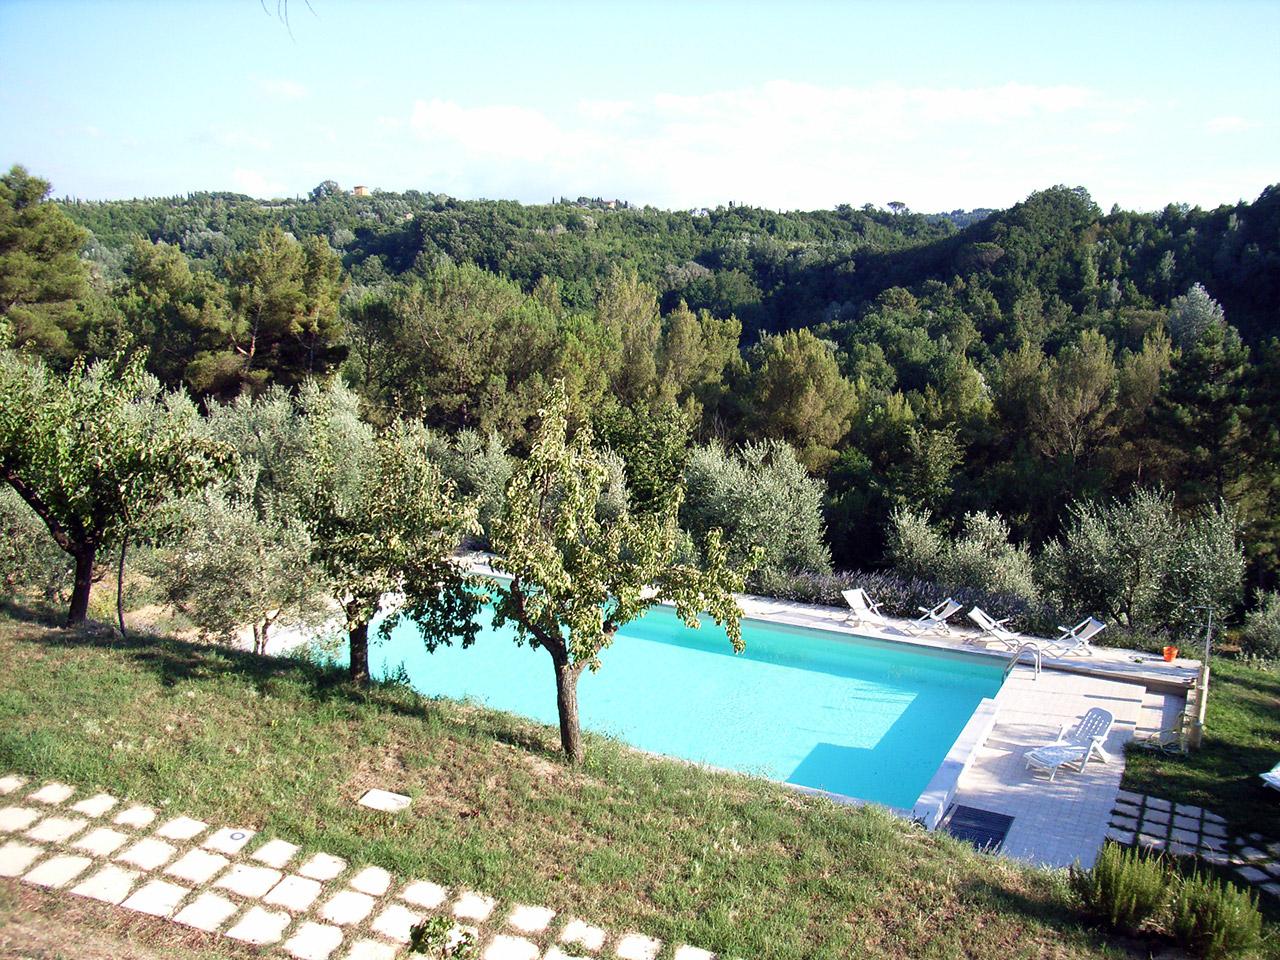 piscina01_toscananascosta